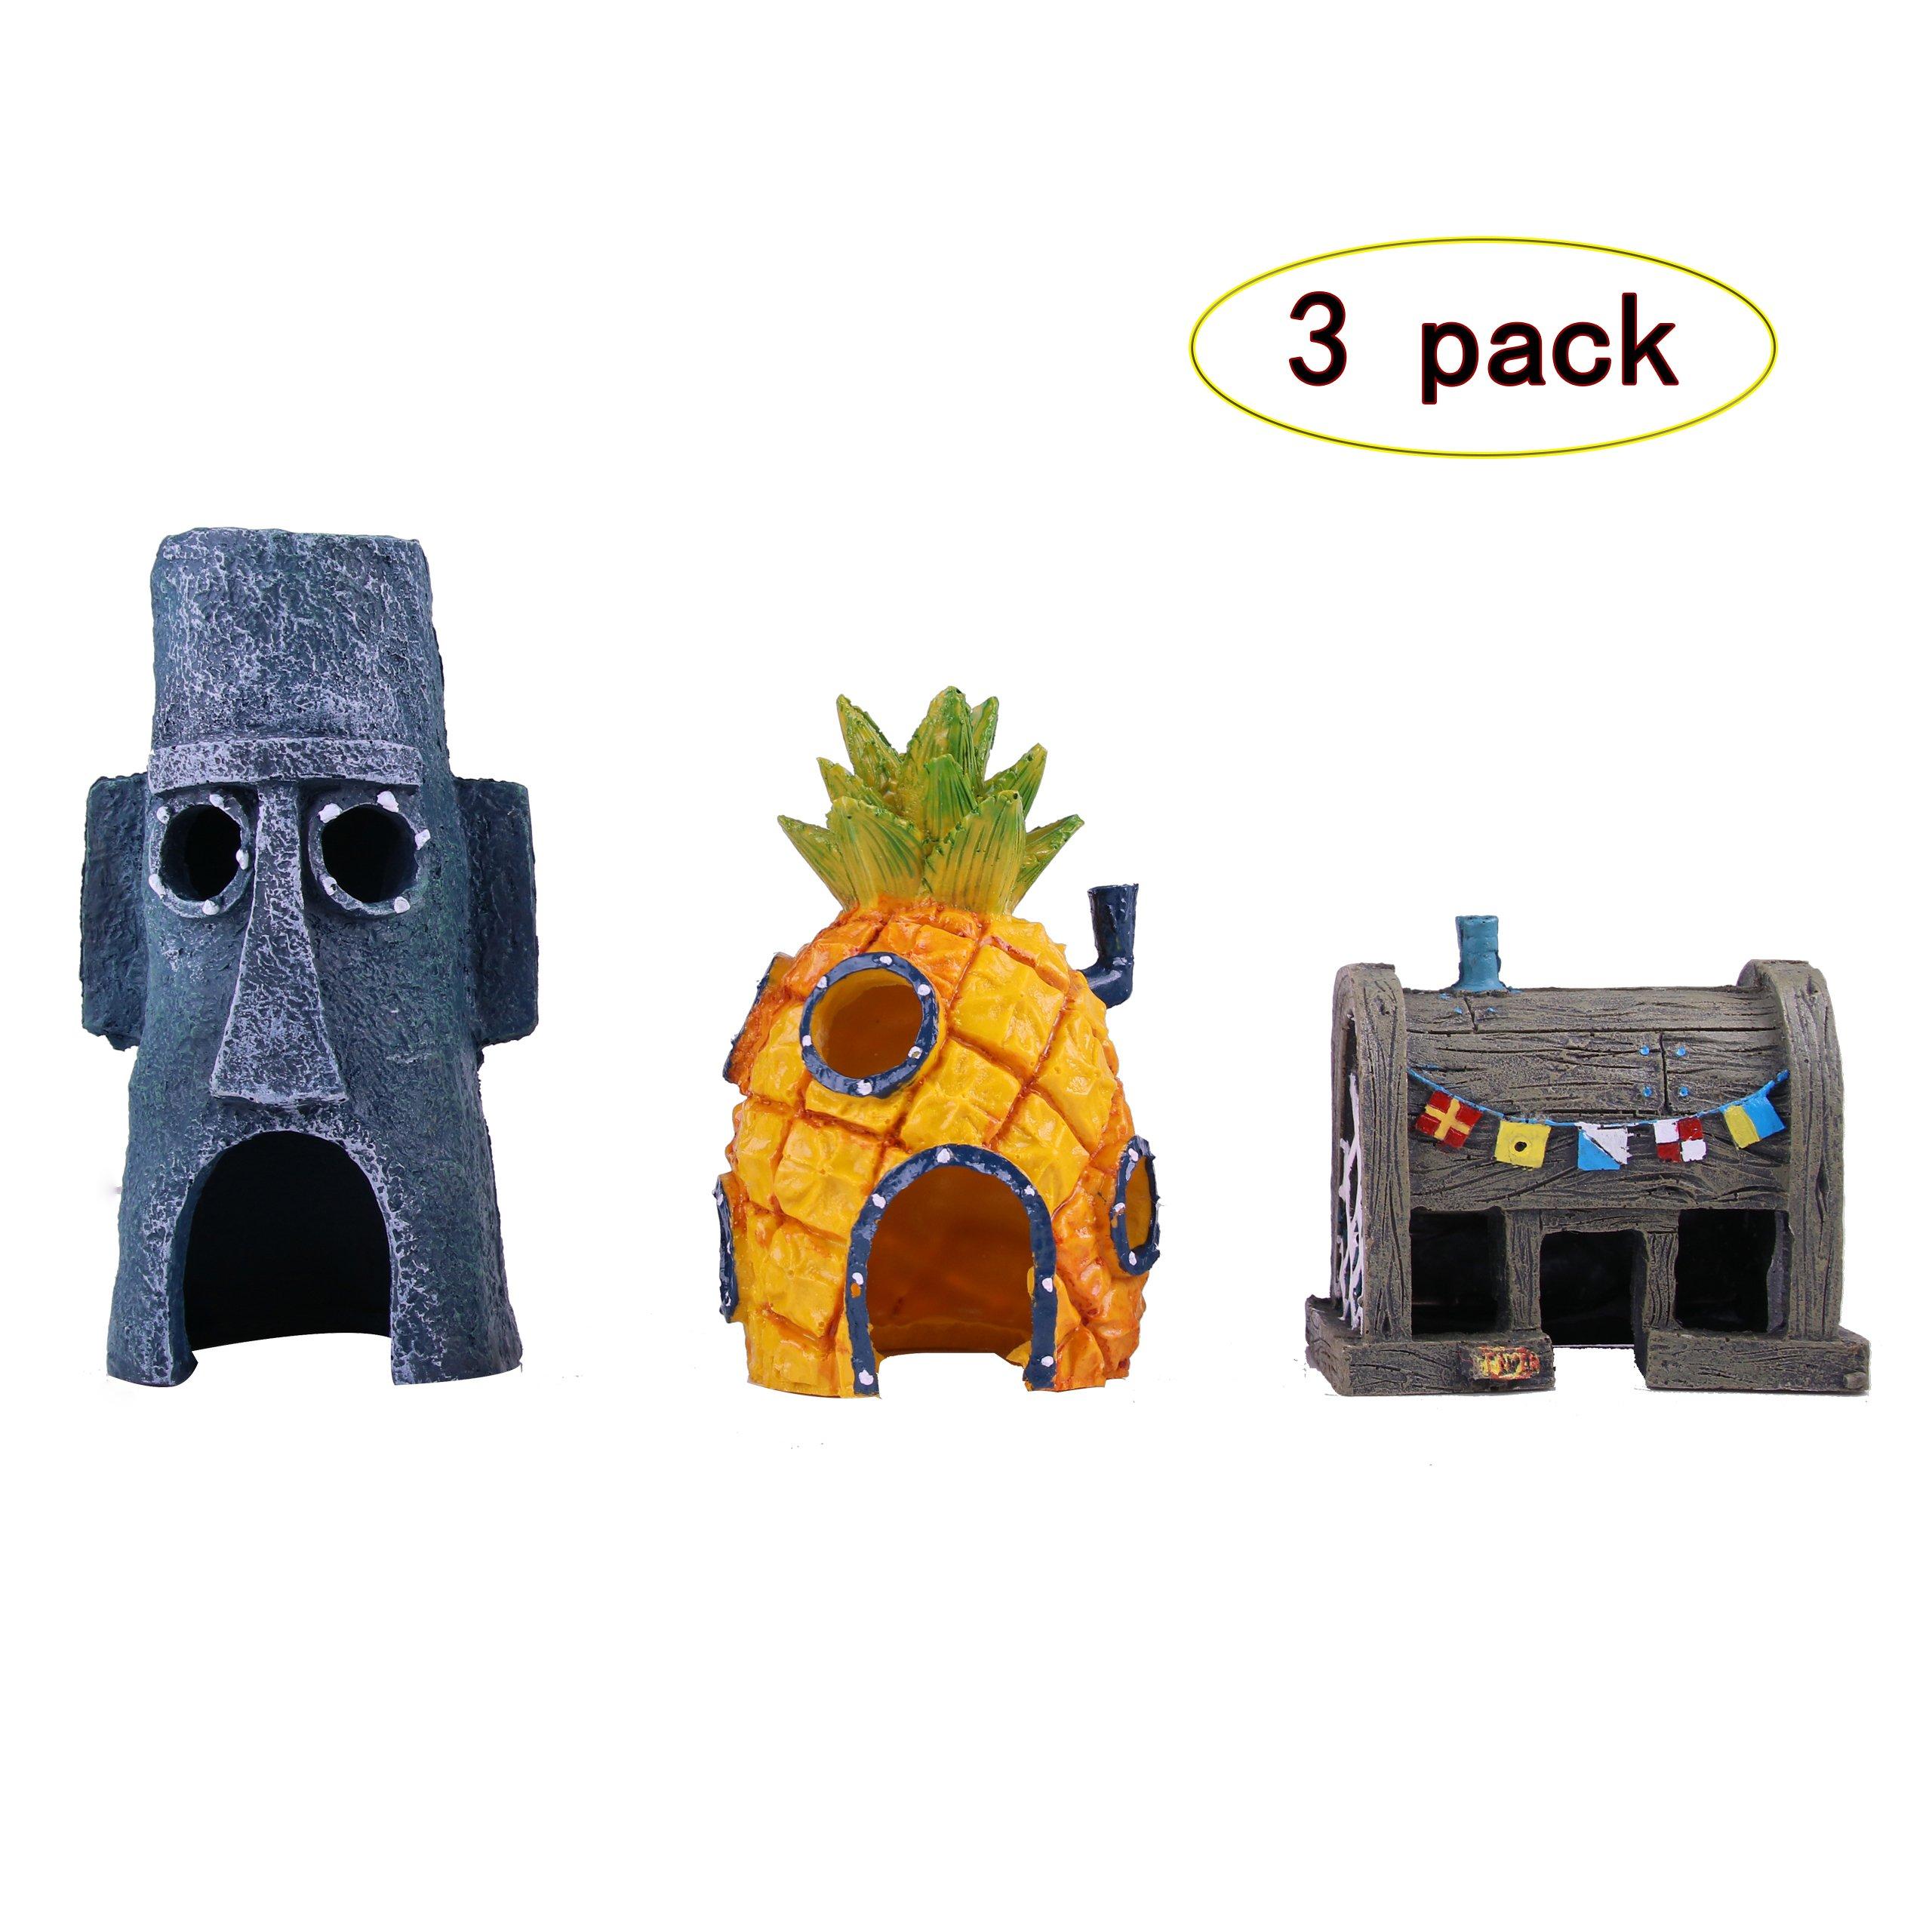 Magic Design Penn-Plax SpongeBob Aquarium Decoration Durable Resin pack of 3 - Pineapple House, Easter Island Home and Krusty Krab Ornament Pack